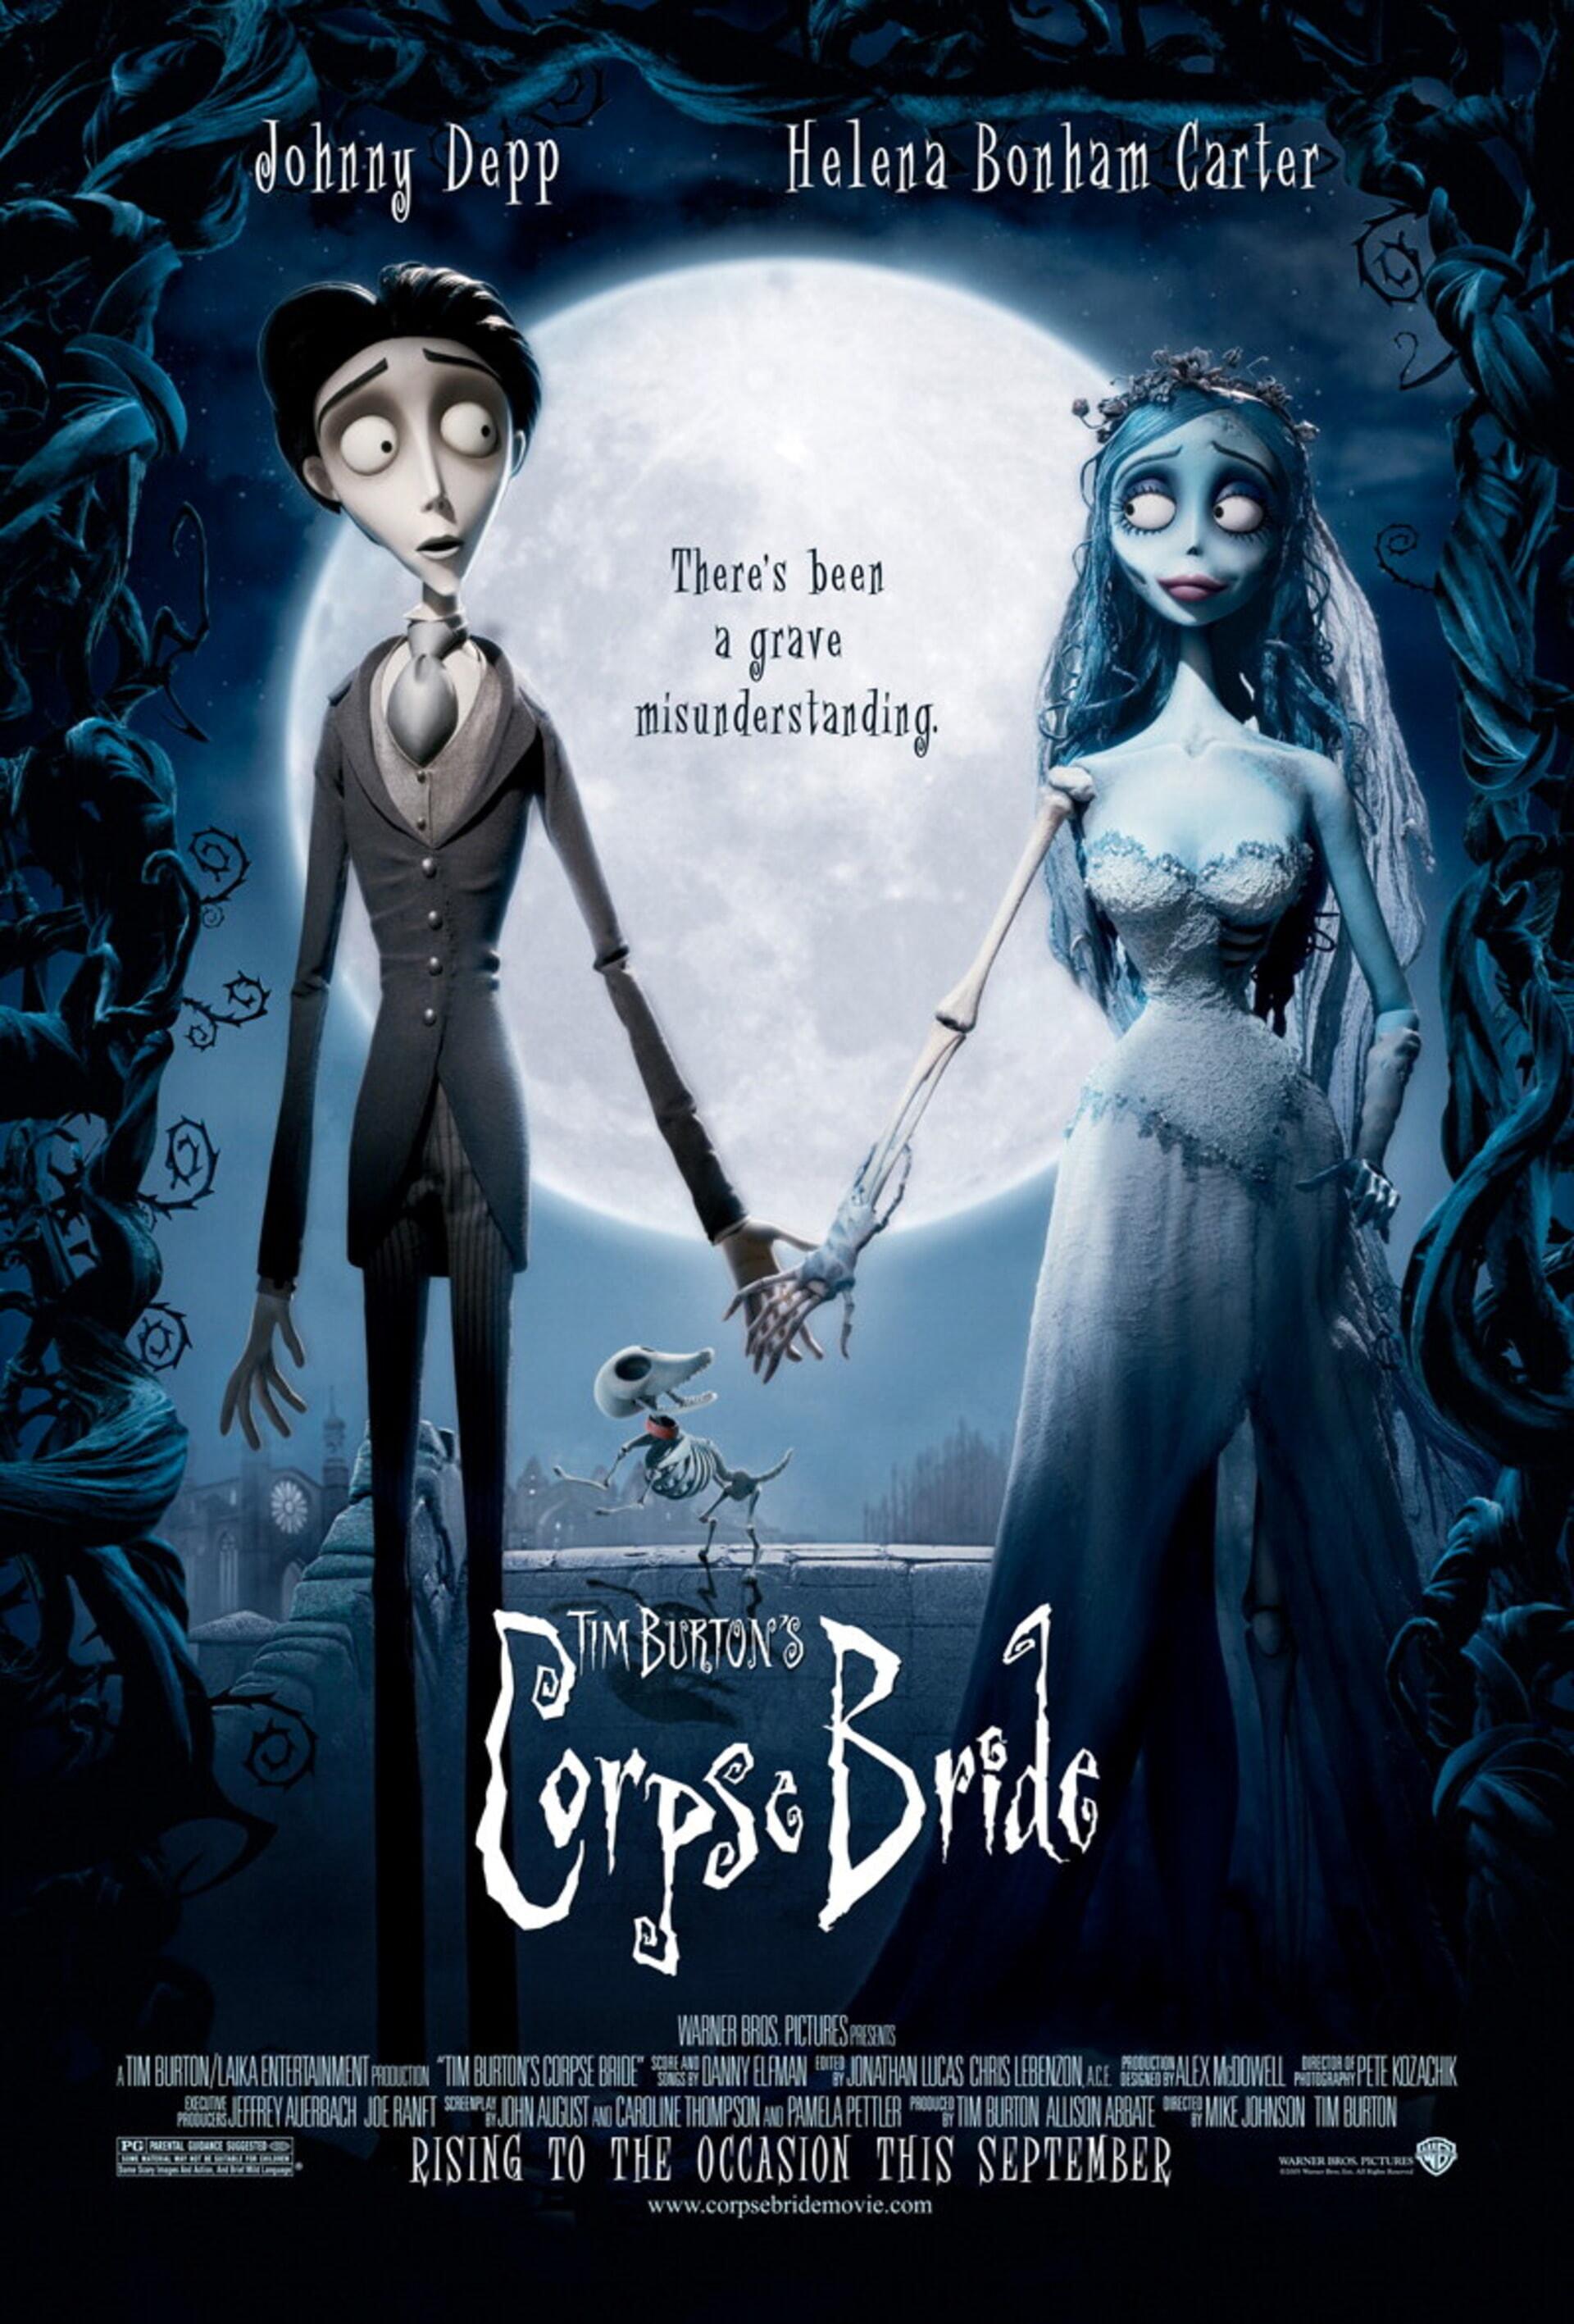 Tim Burton's Corpse Bride - Poster 1